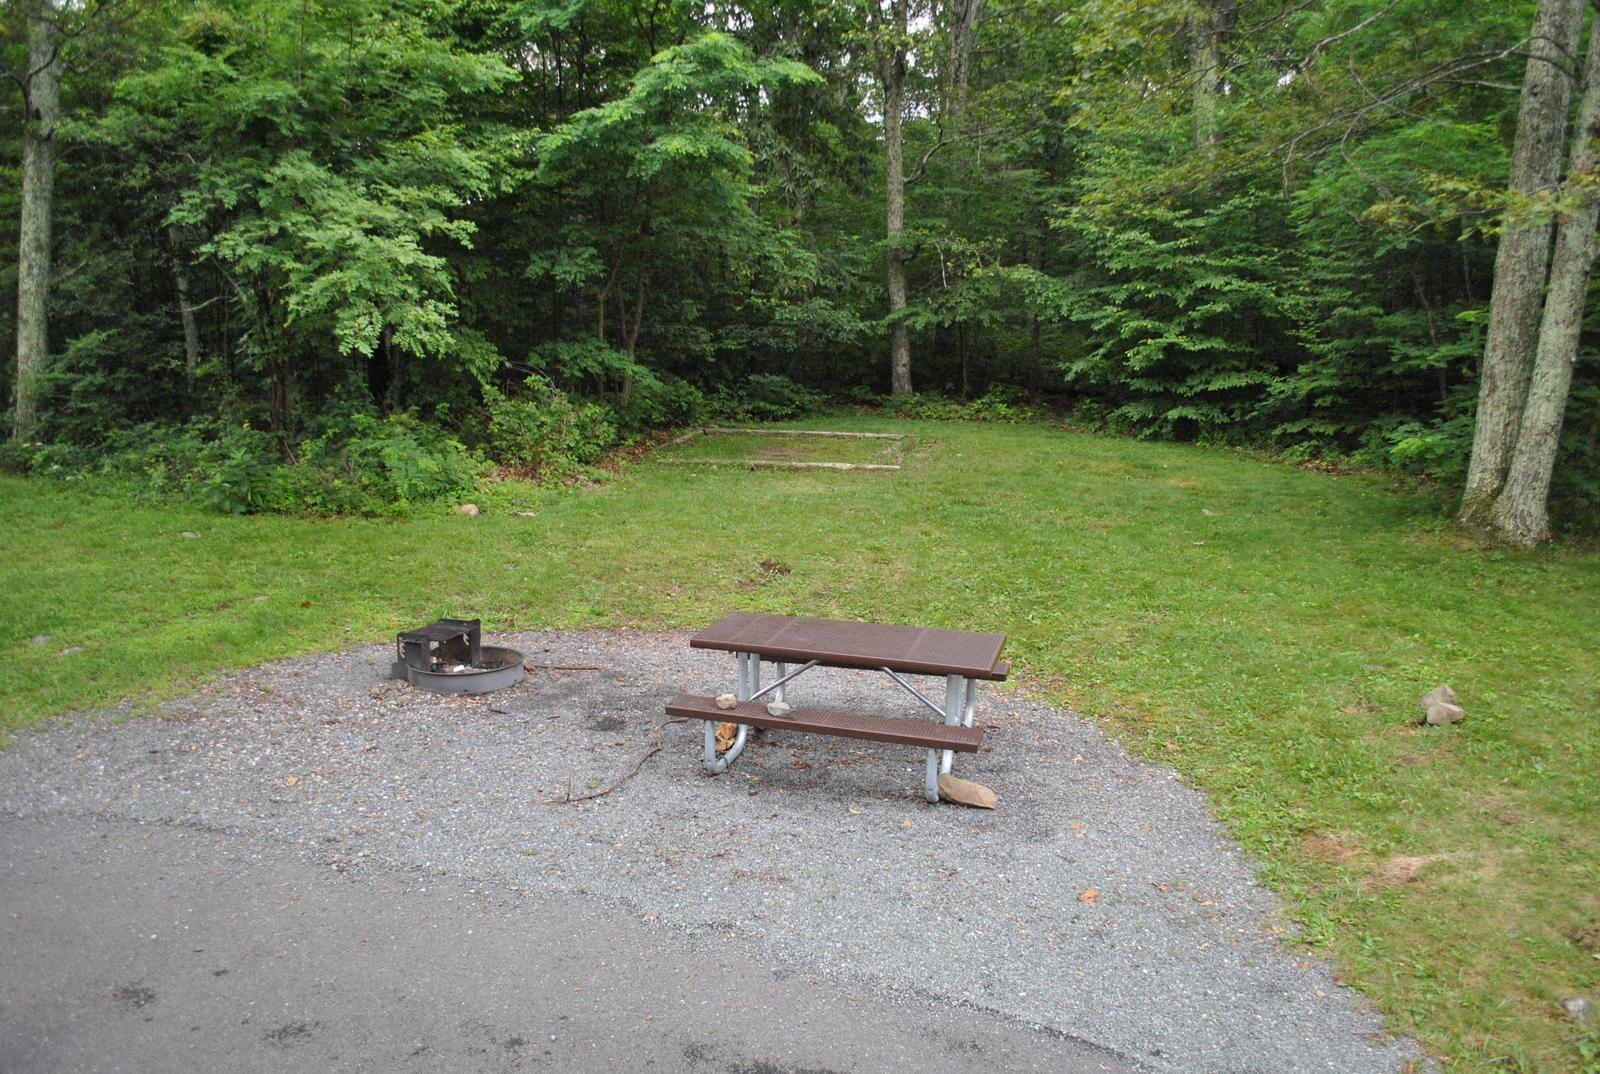 Mathews Arm Campground – Site A049